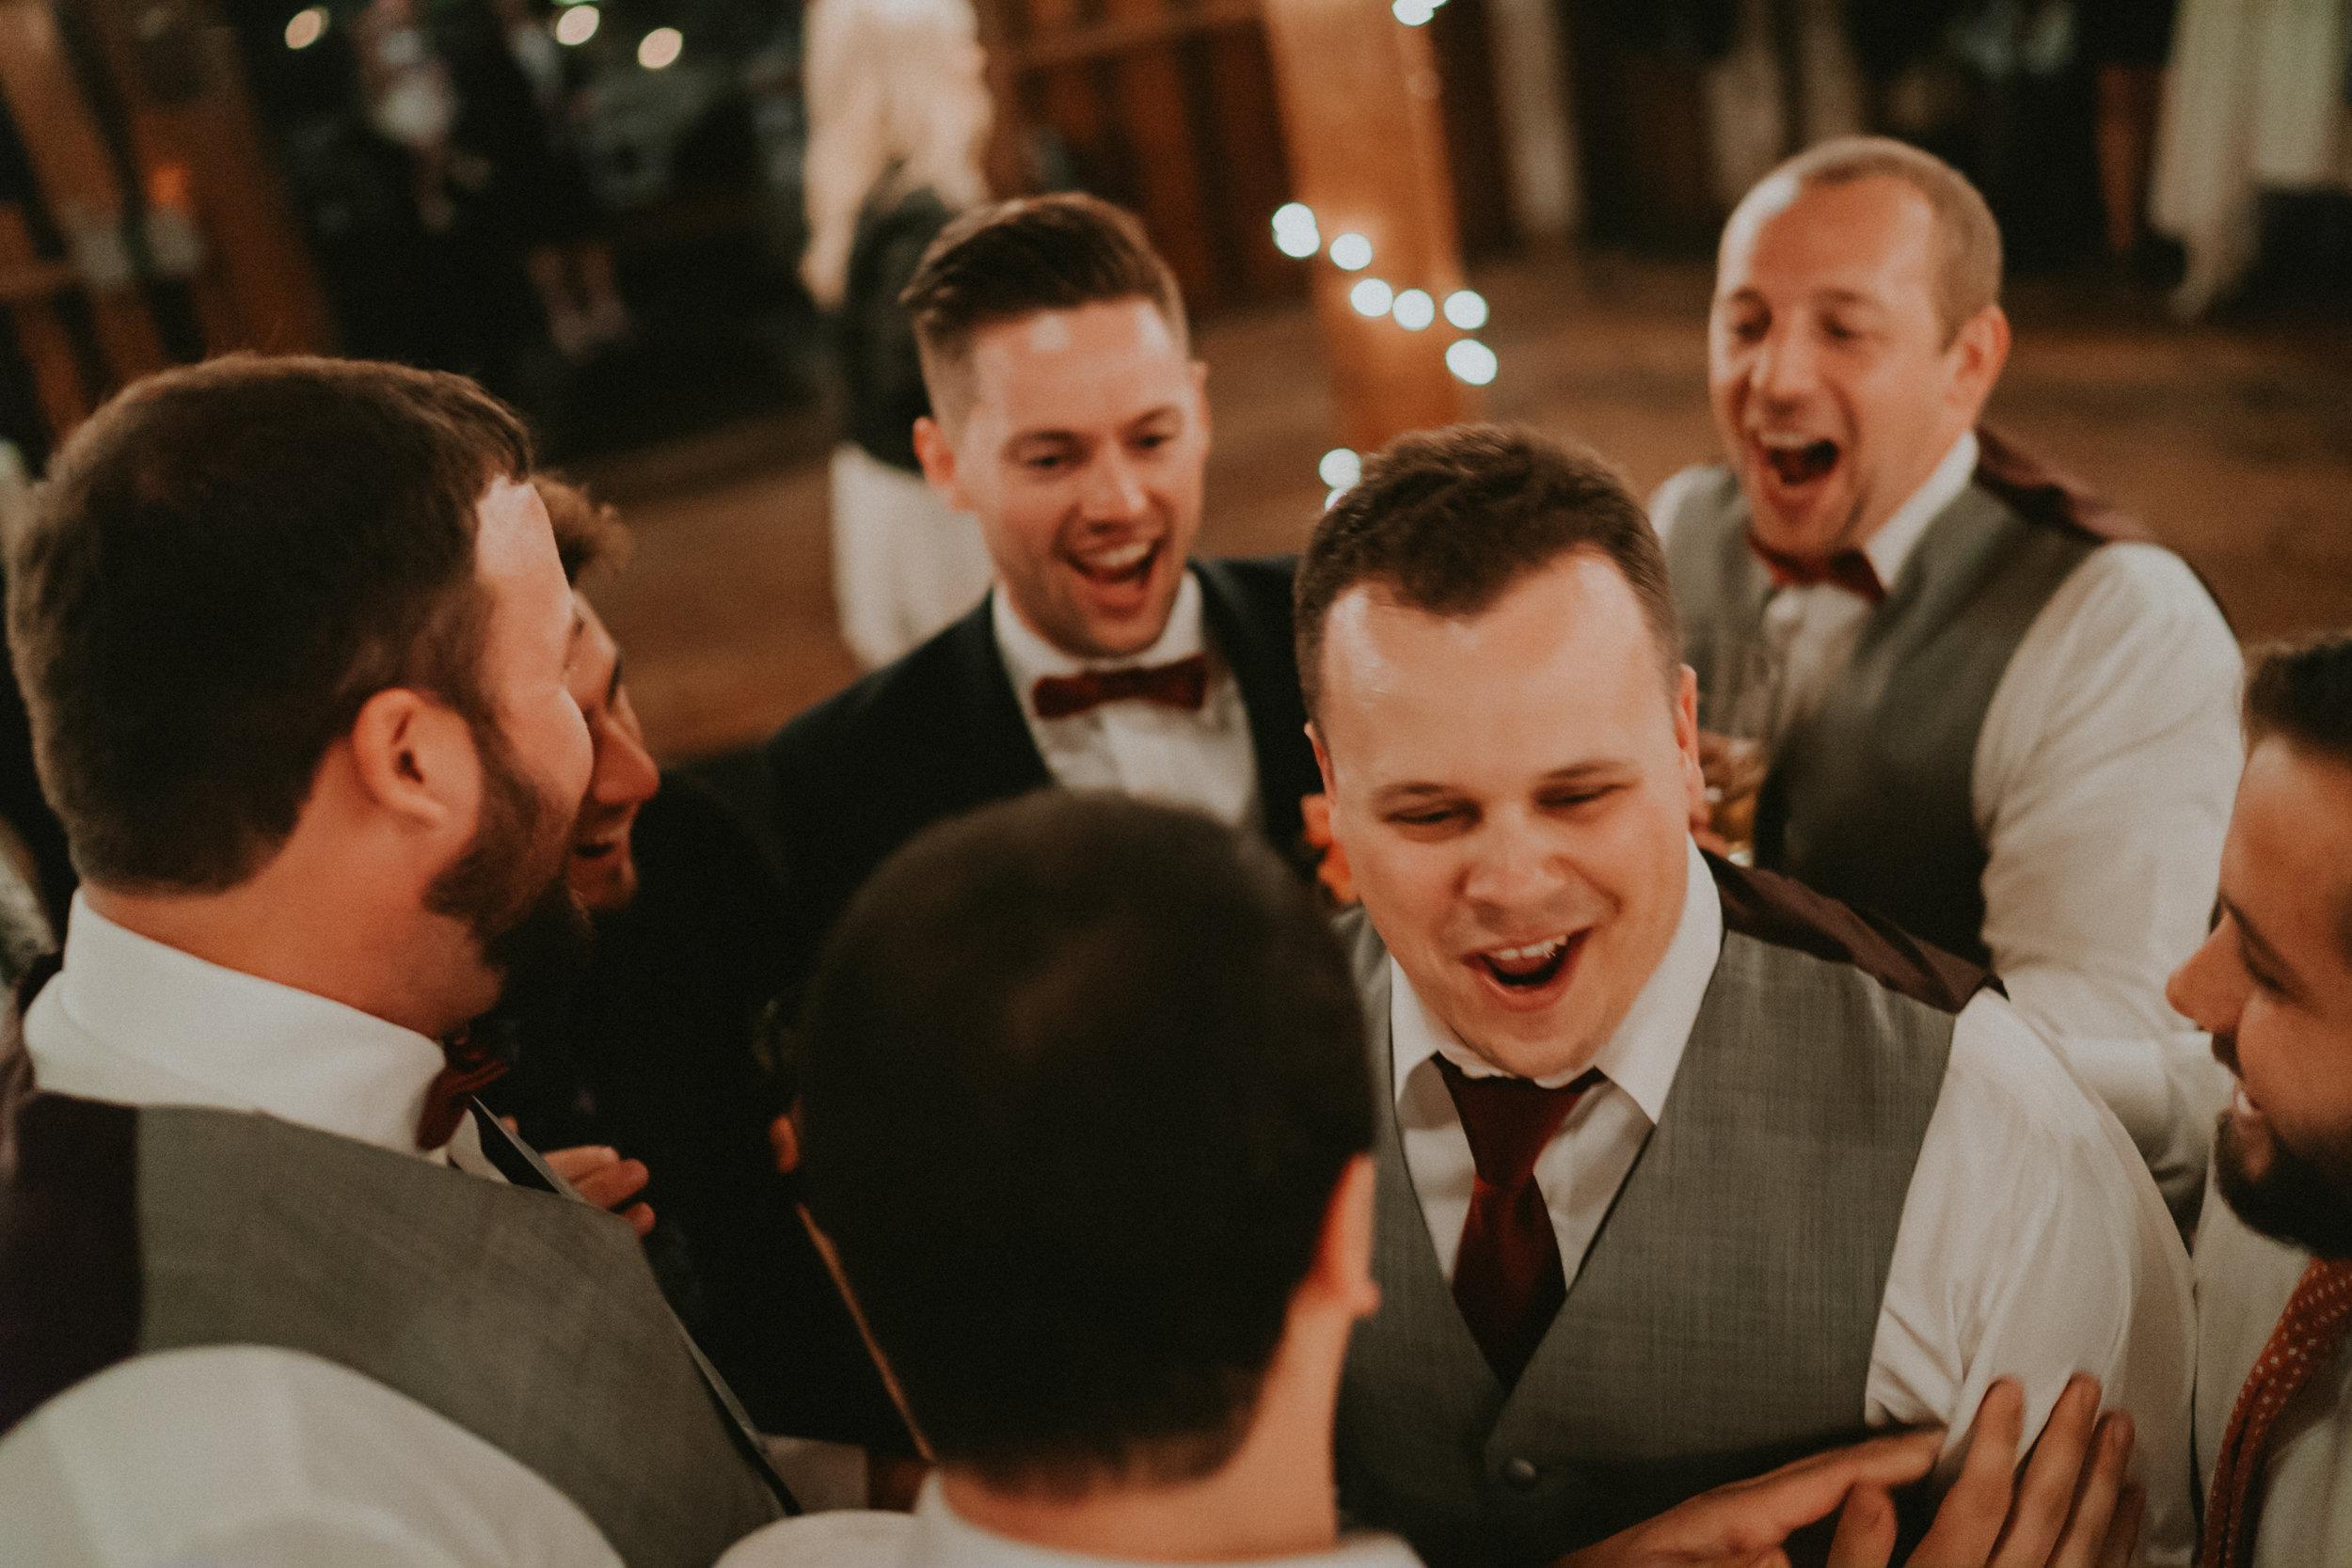 Portland_wedding_photographer_McMenamins_Alfred_Tang-103.jpg